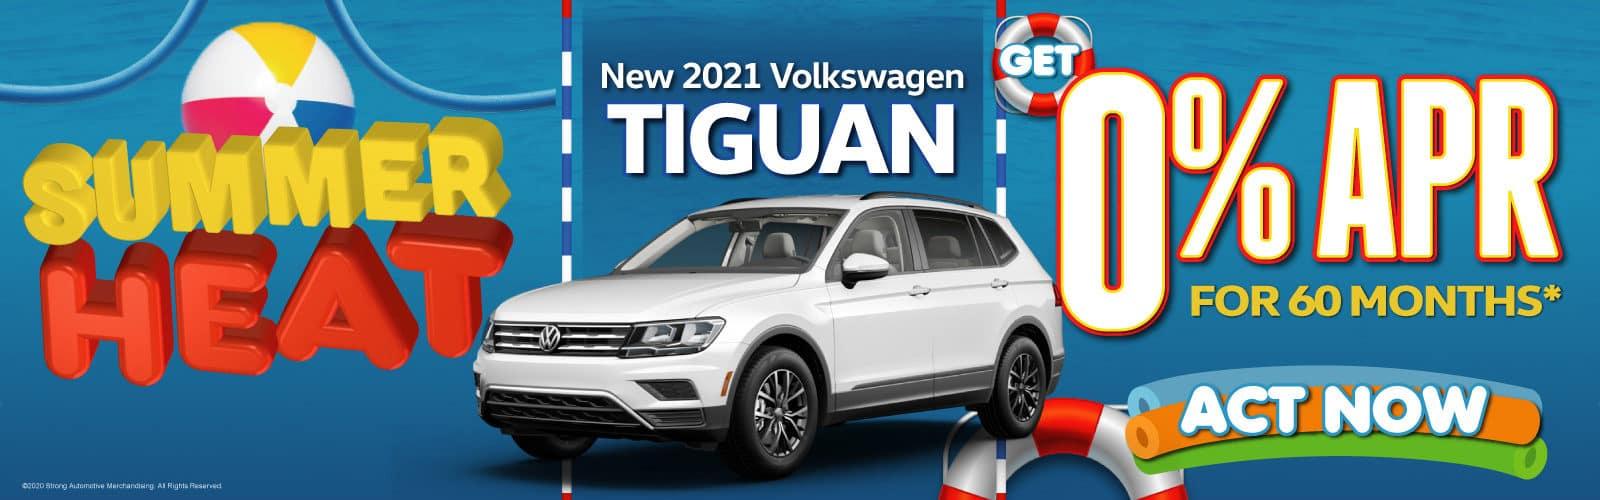 New 2021 VW Tiguan - 0% APR for 60 months